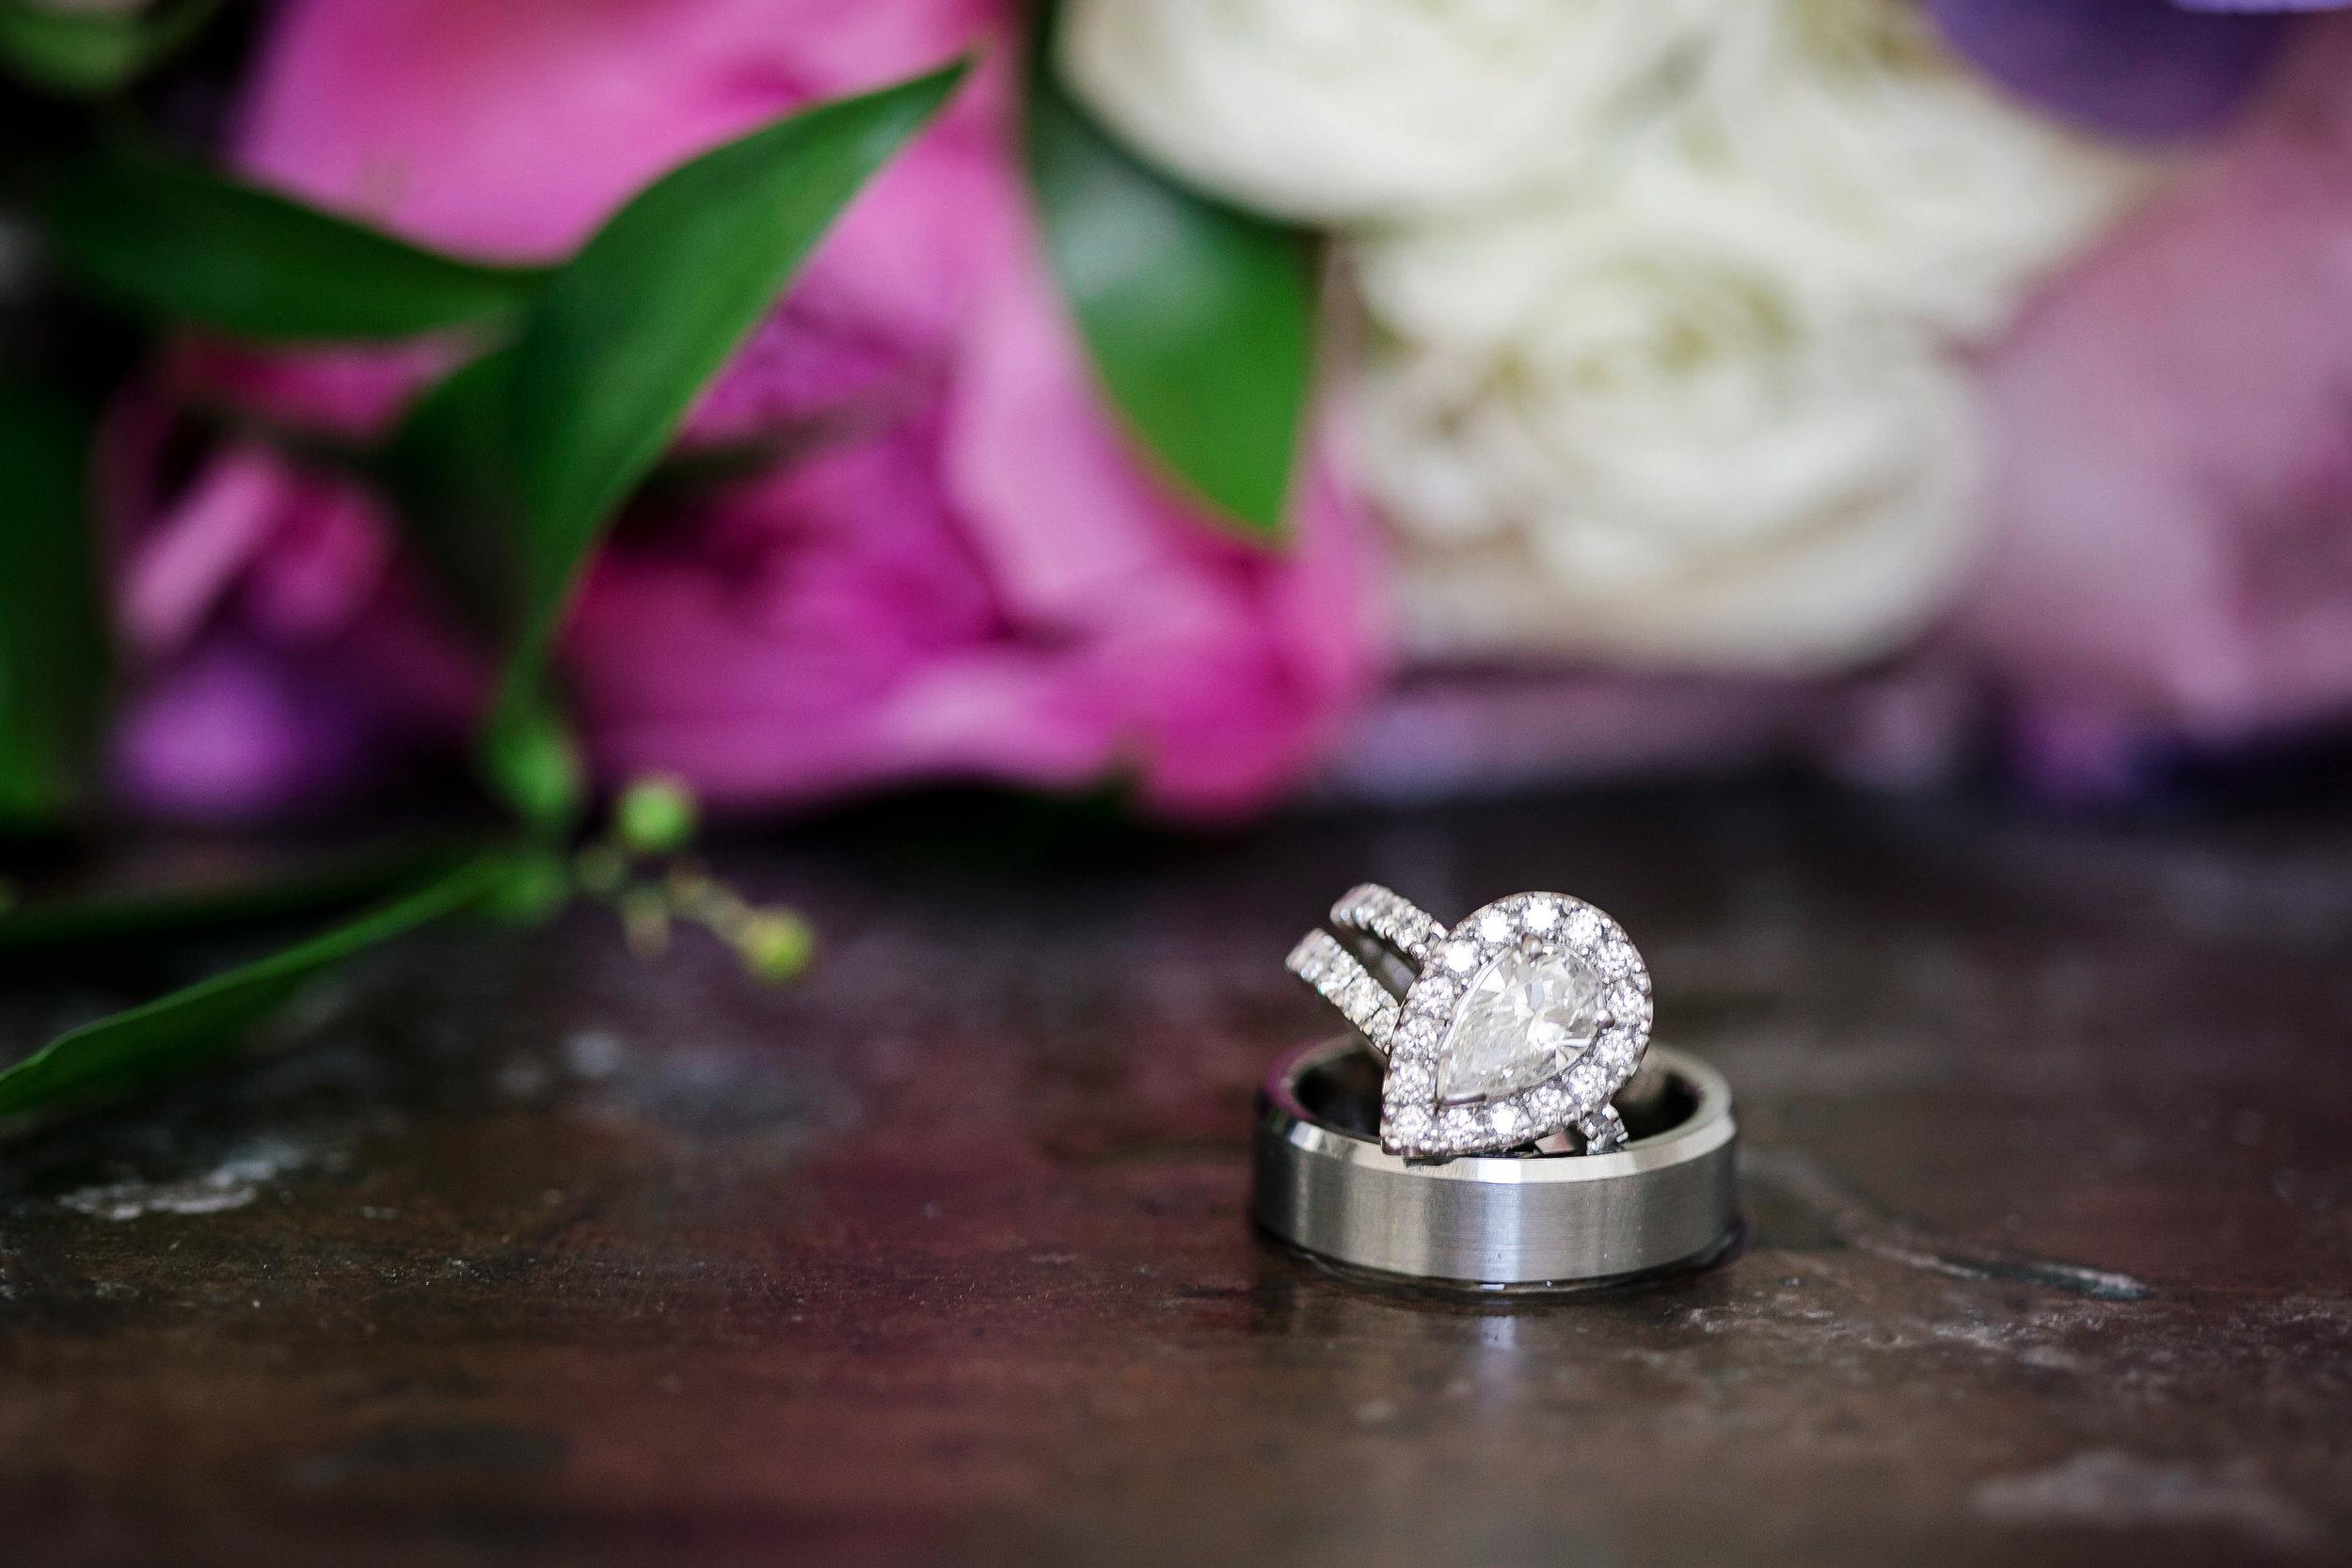 Martinborough-Poppies-Wedding-Caine-Eloise-Toni-Larsen-0008.jpg